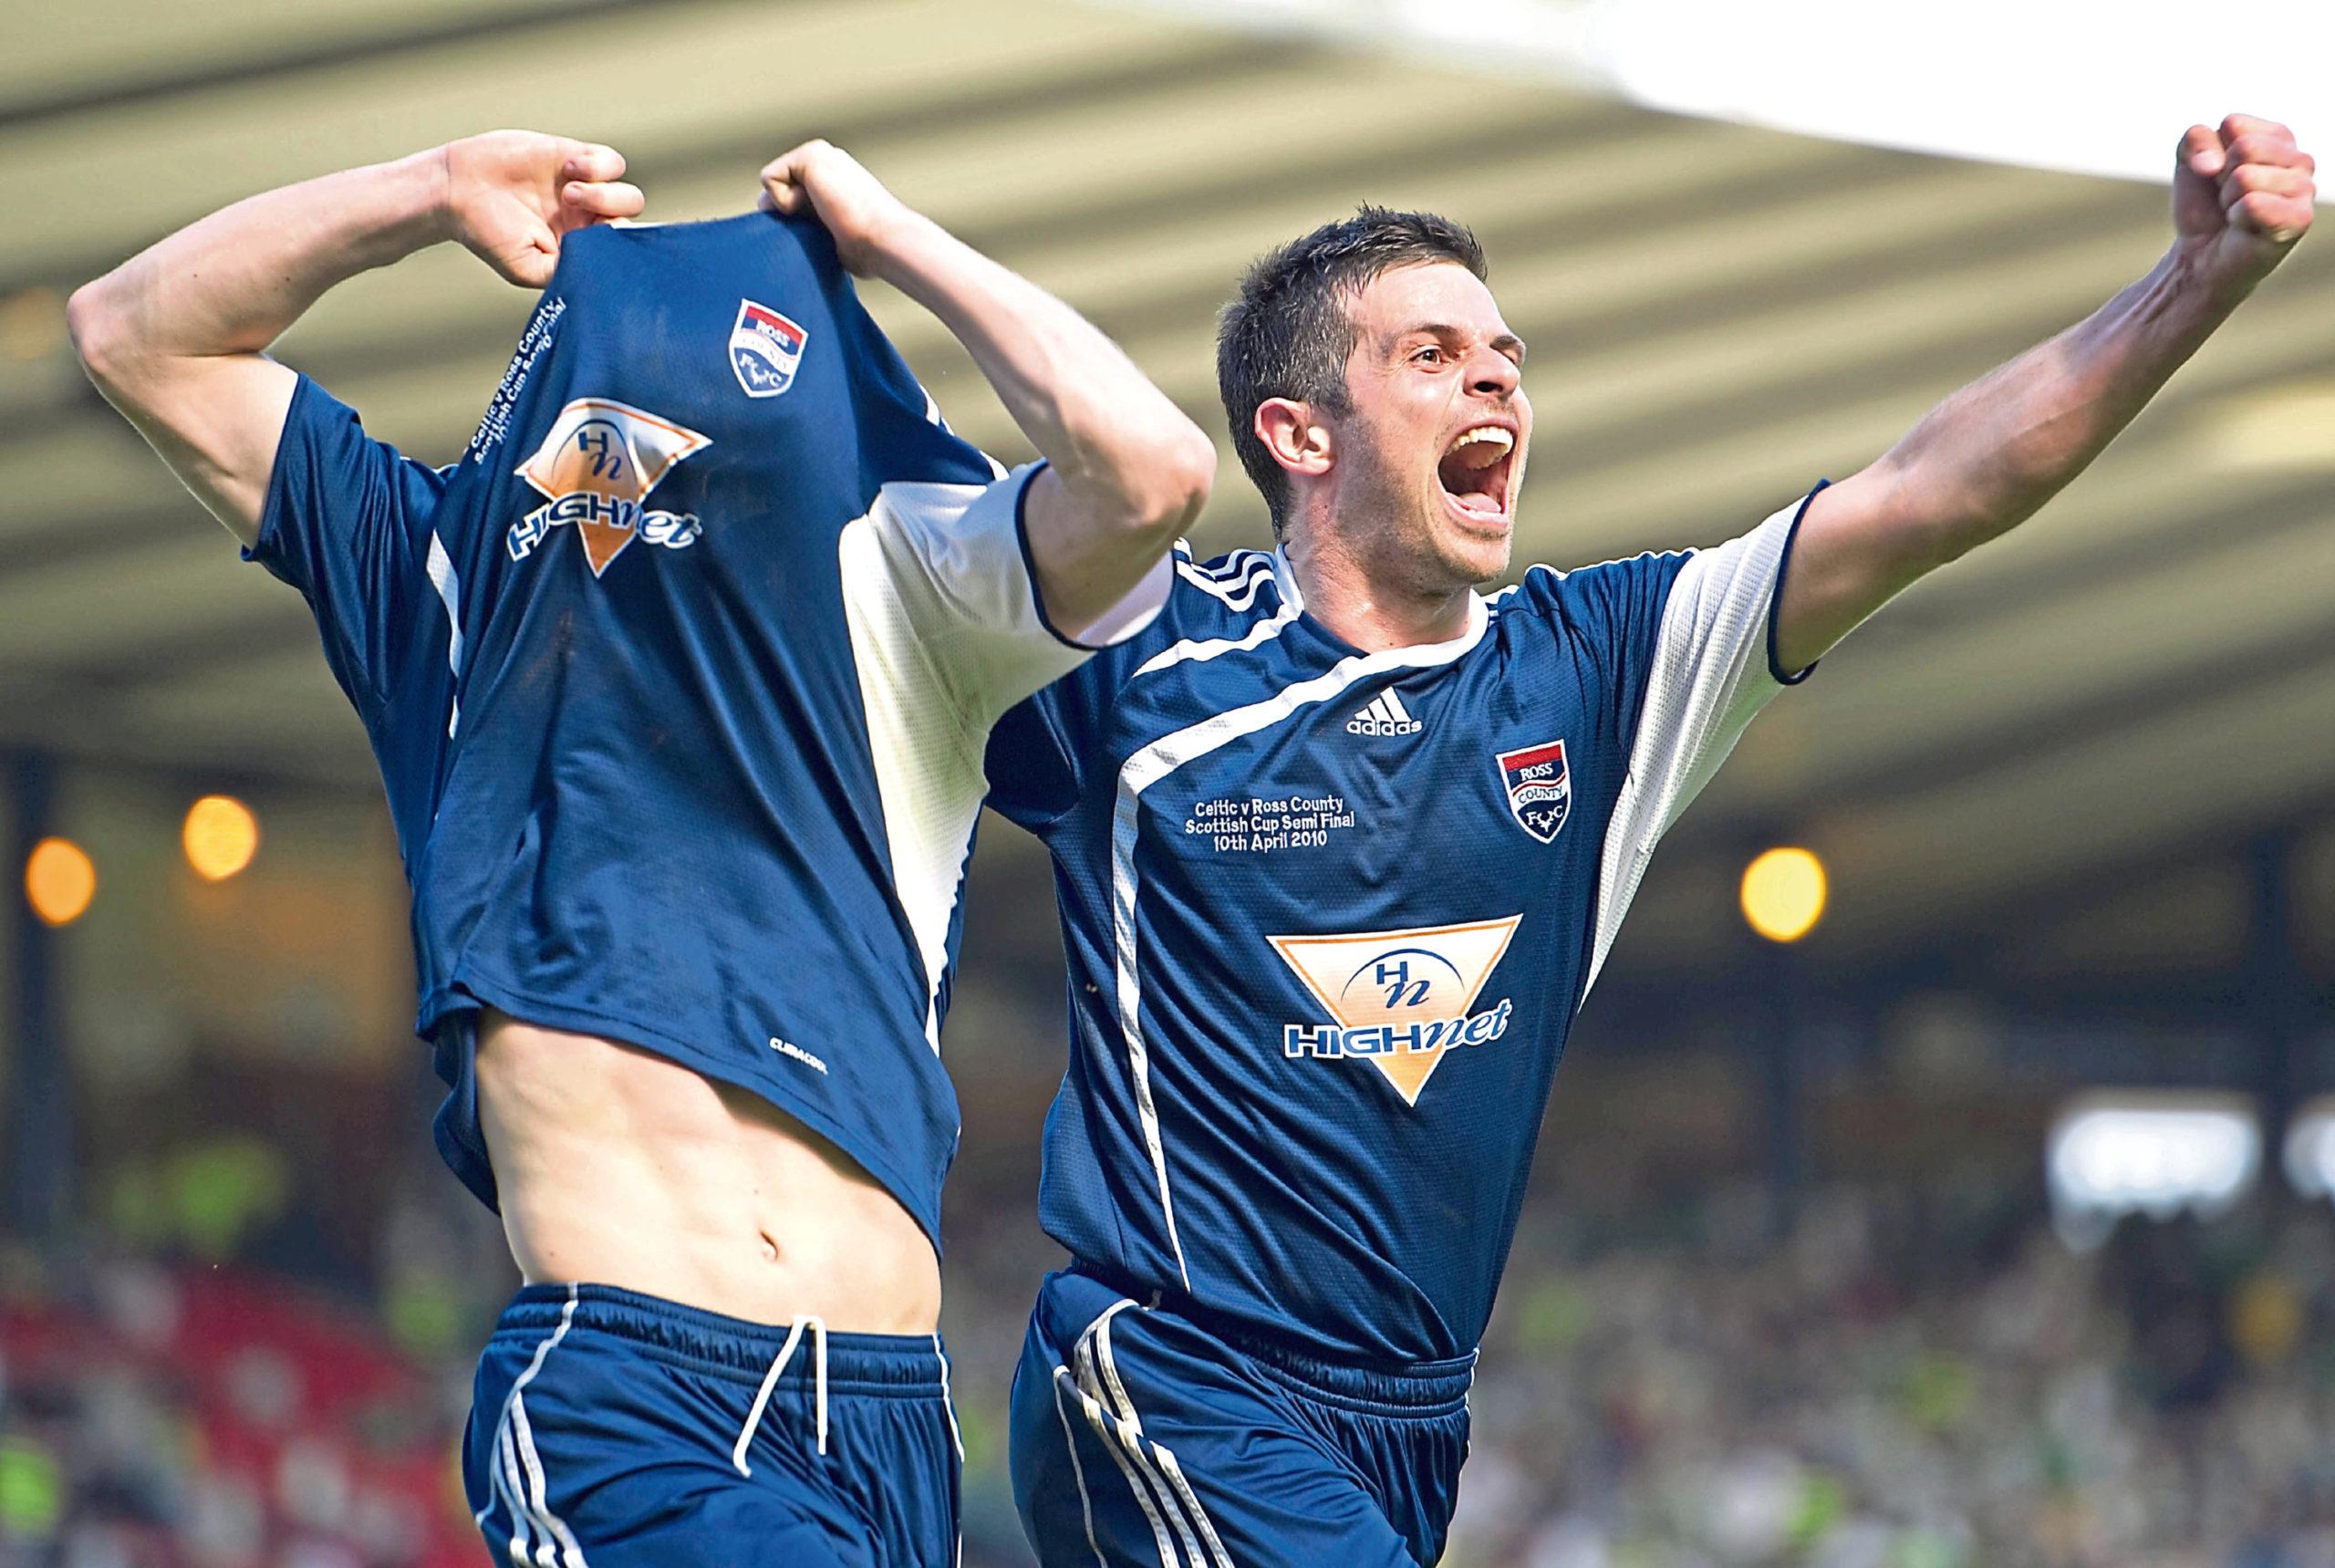 Ross County star Martin Scott (left) celebrates with fellow goalscorer Steven Craig after making it 2-0.